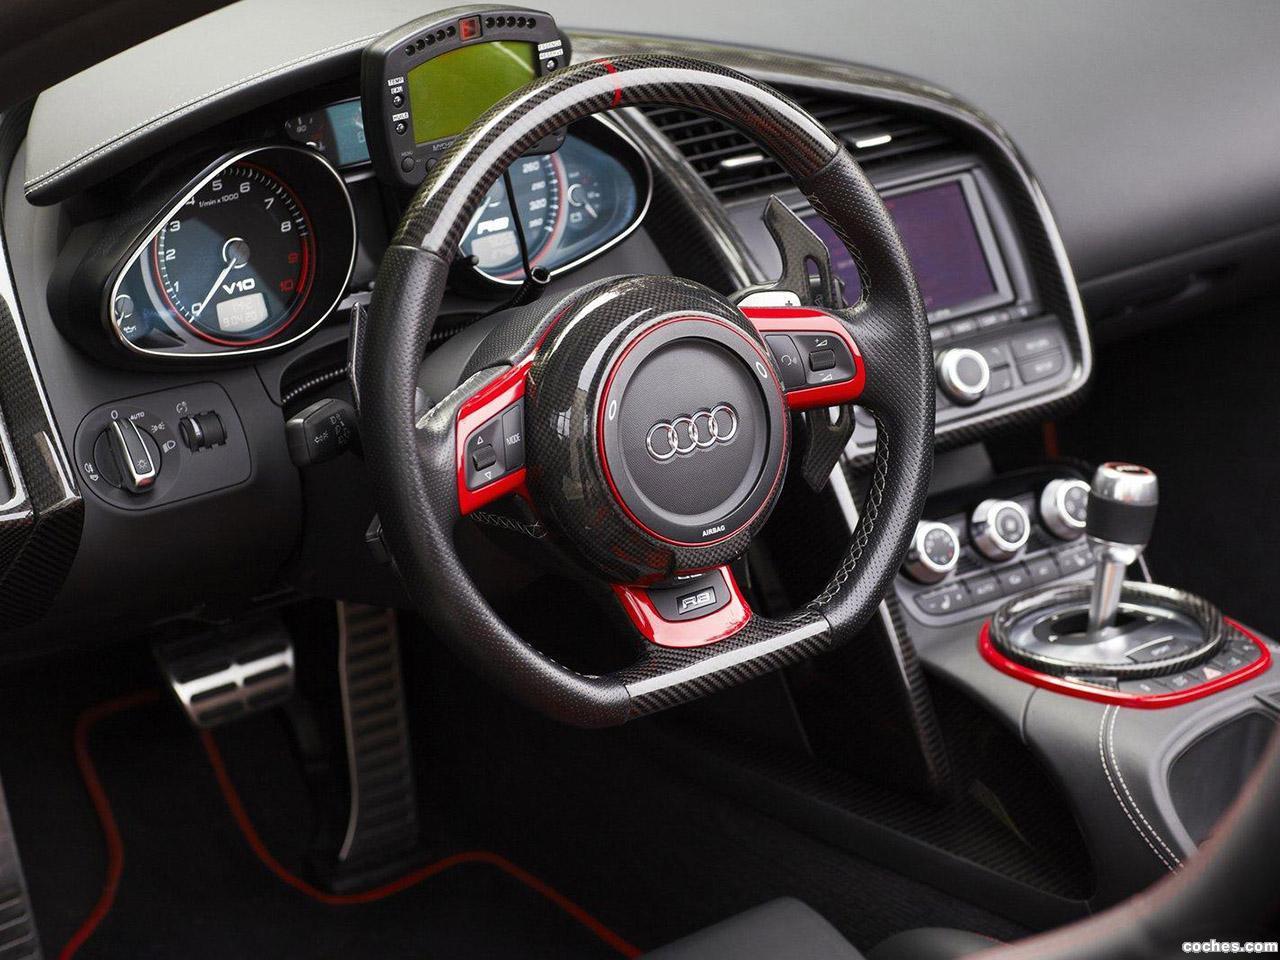 Foto 3 de Audi R8 Spyder V10 RENM RMS 2011